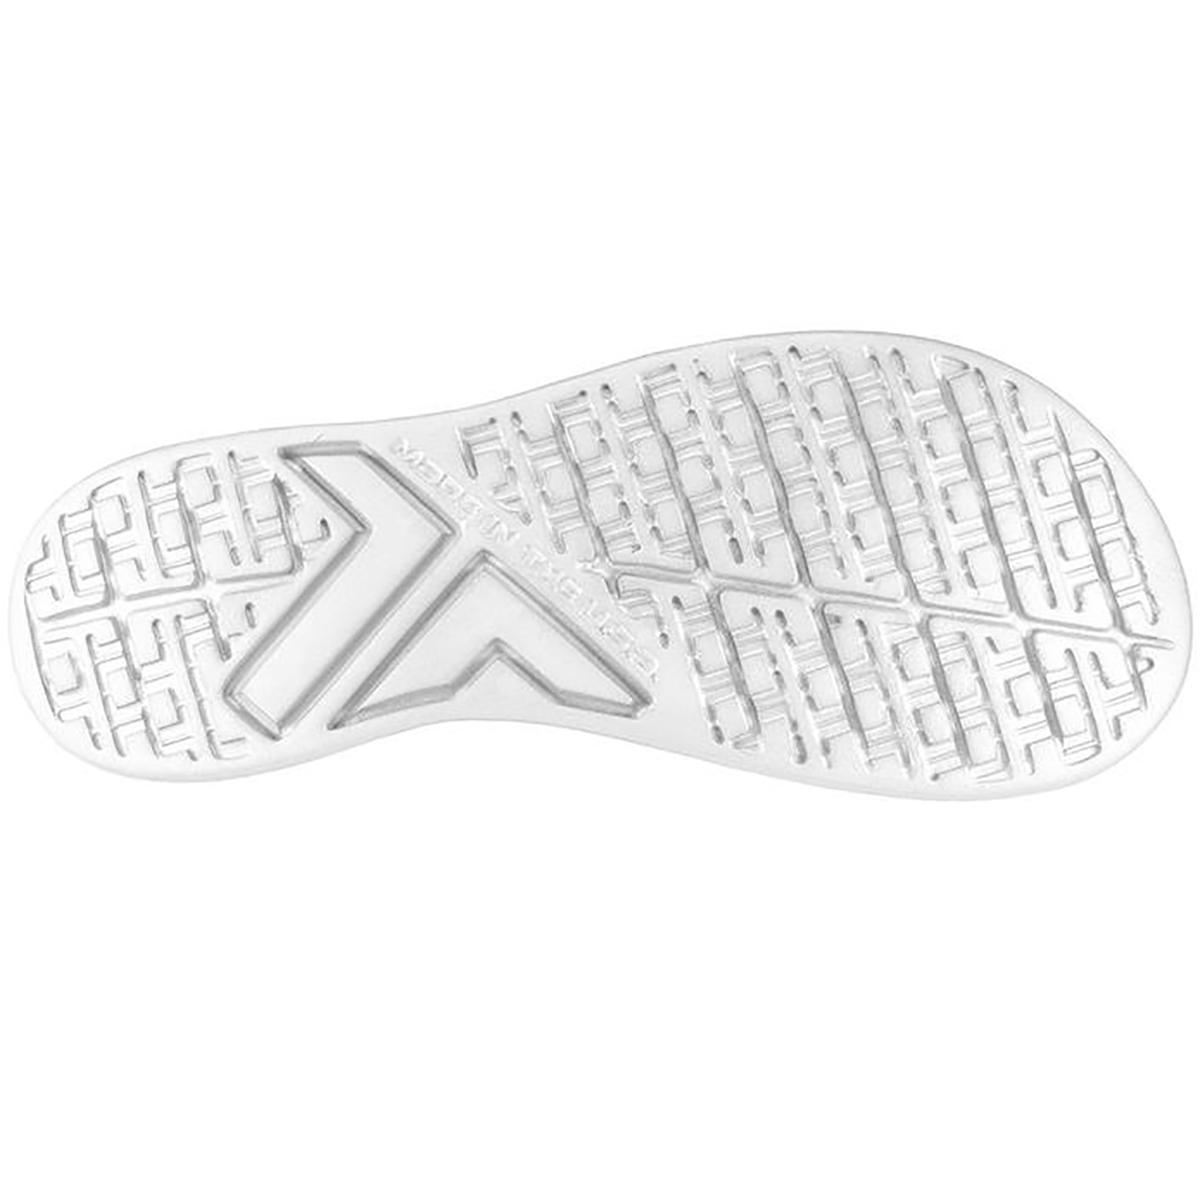 Telic-Unisex-Signature-Style-Arch-Support-Pain-Relief-Flip-Flops thumbnail 36